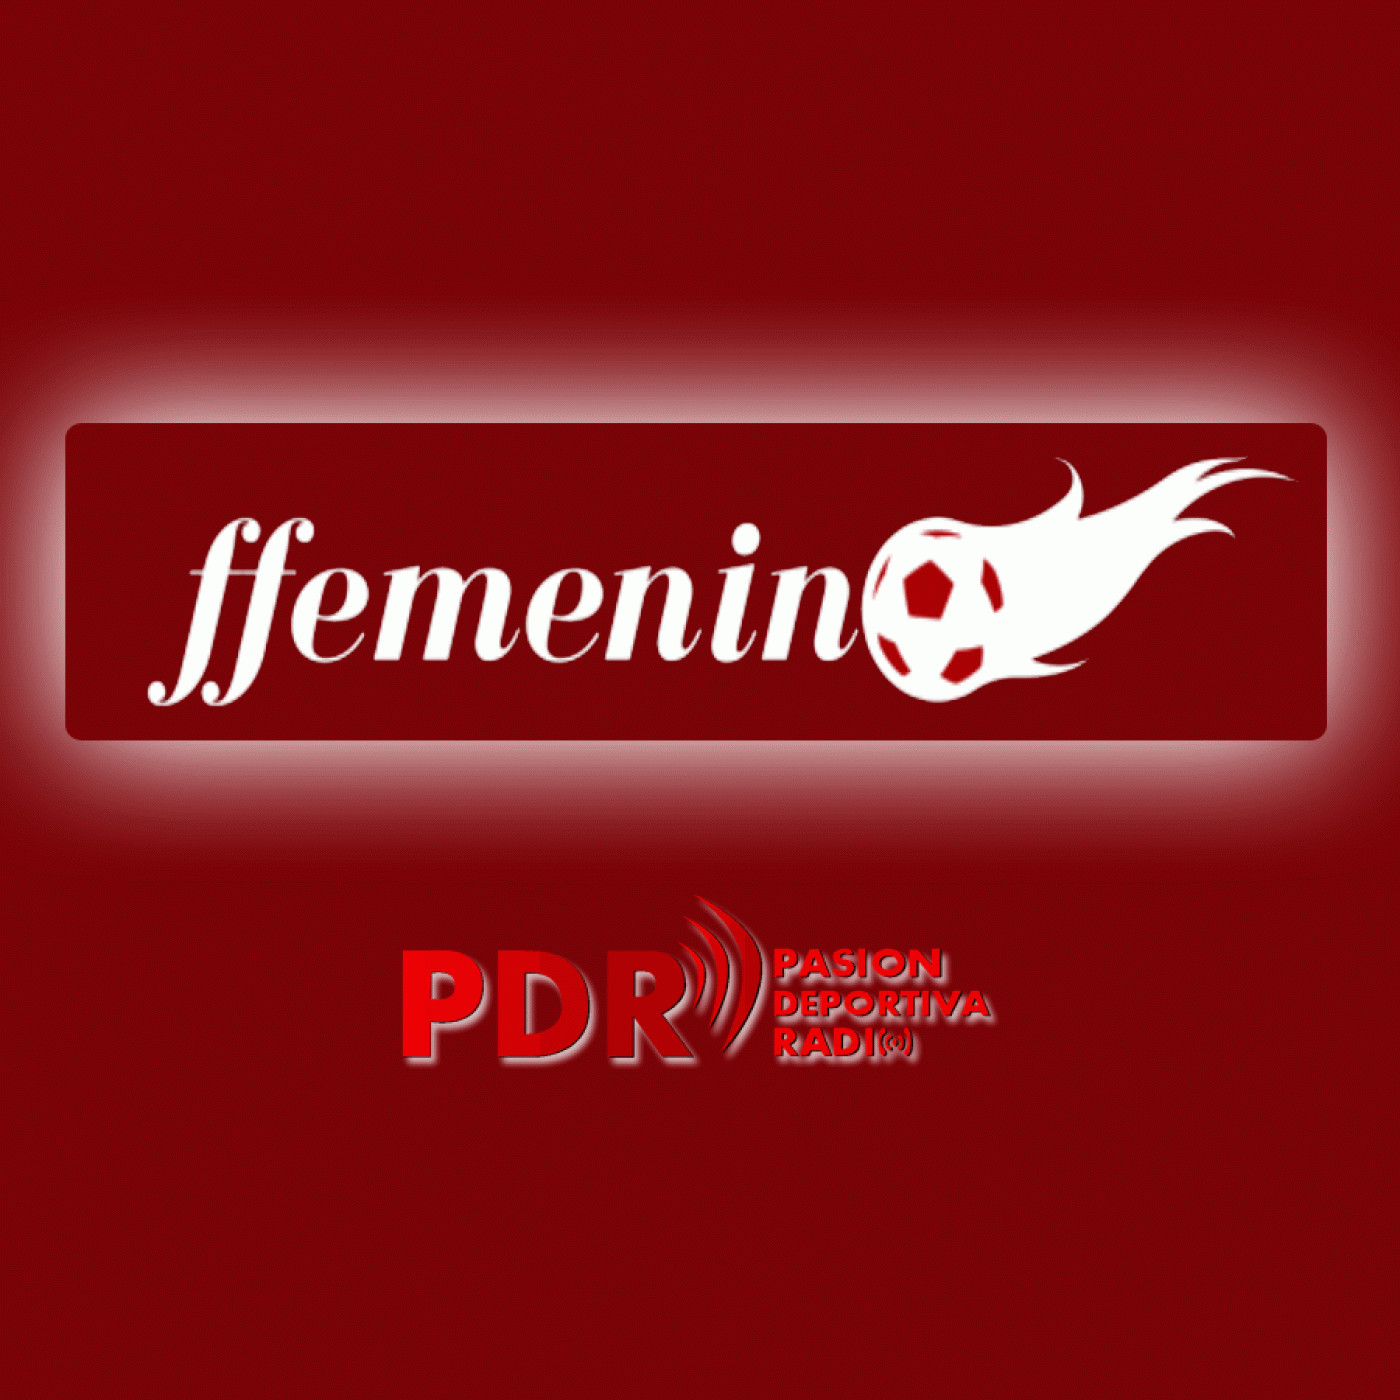 <![CDATA[Programa FFemenino Radio]]>